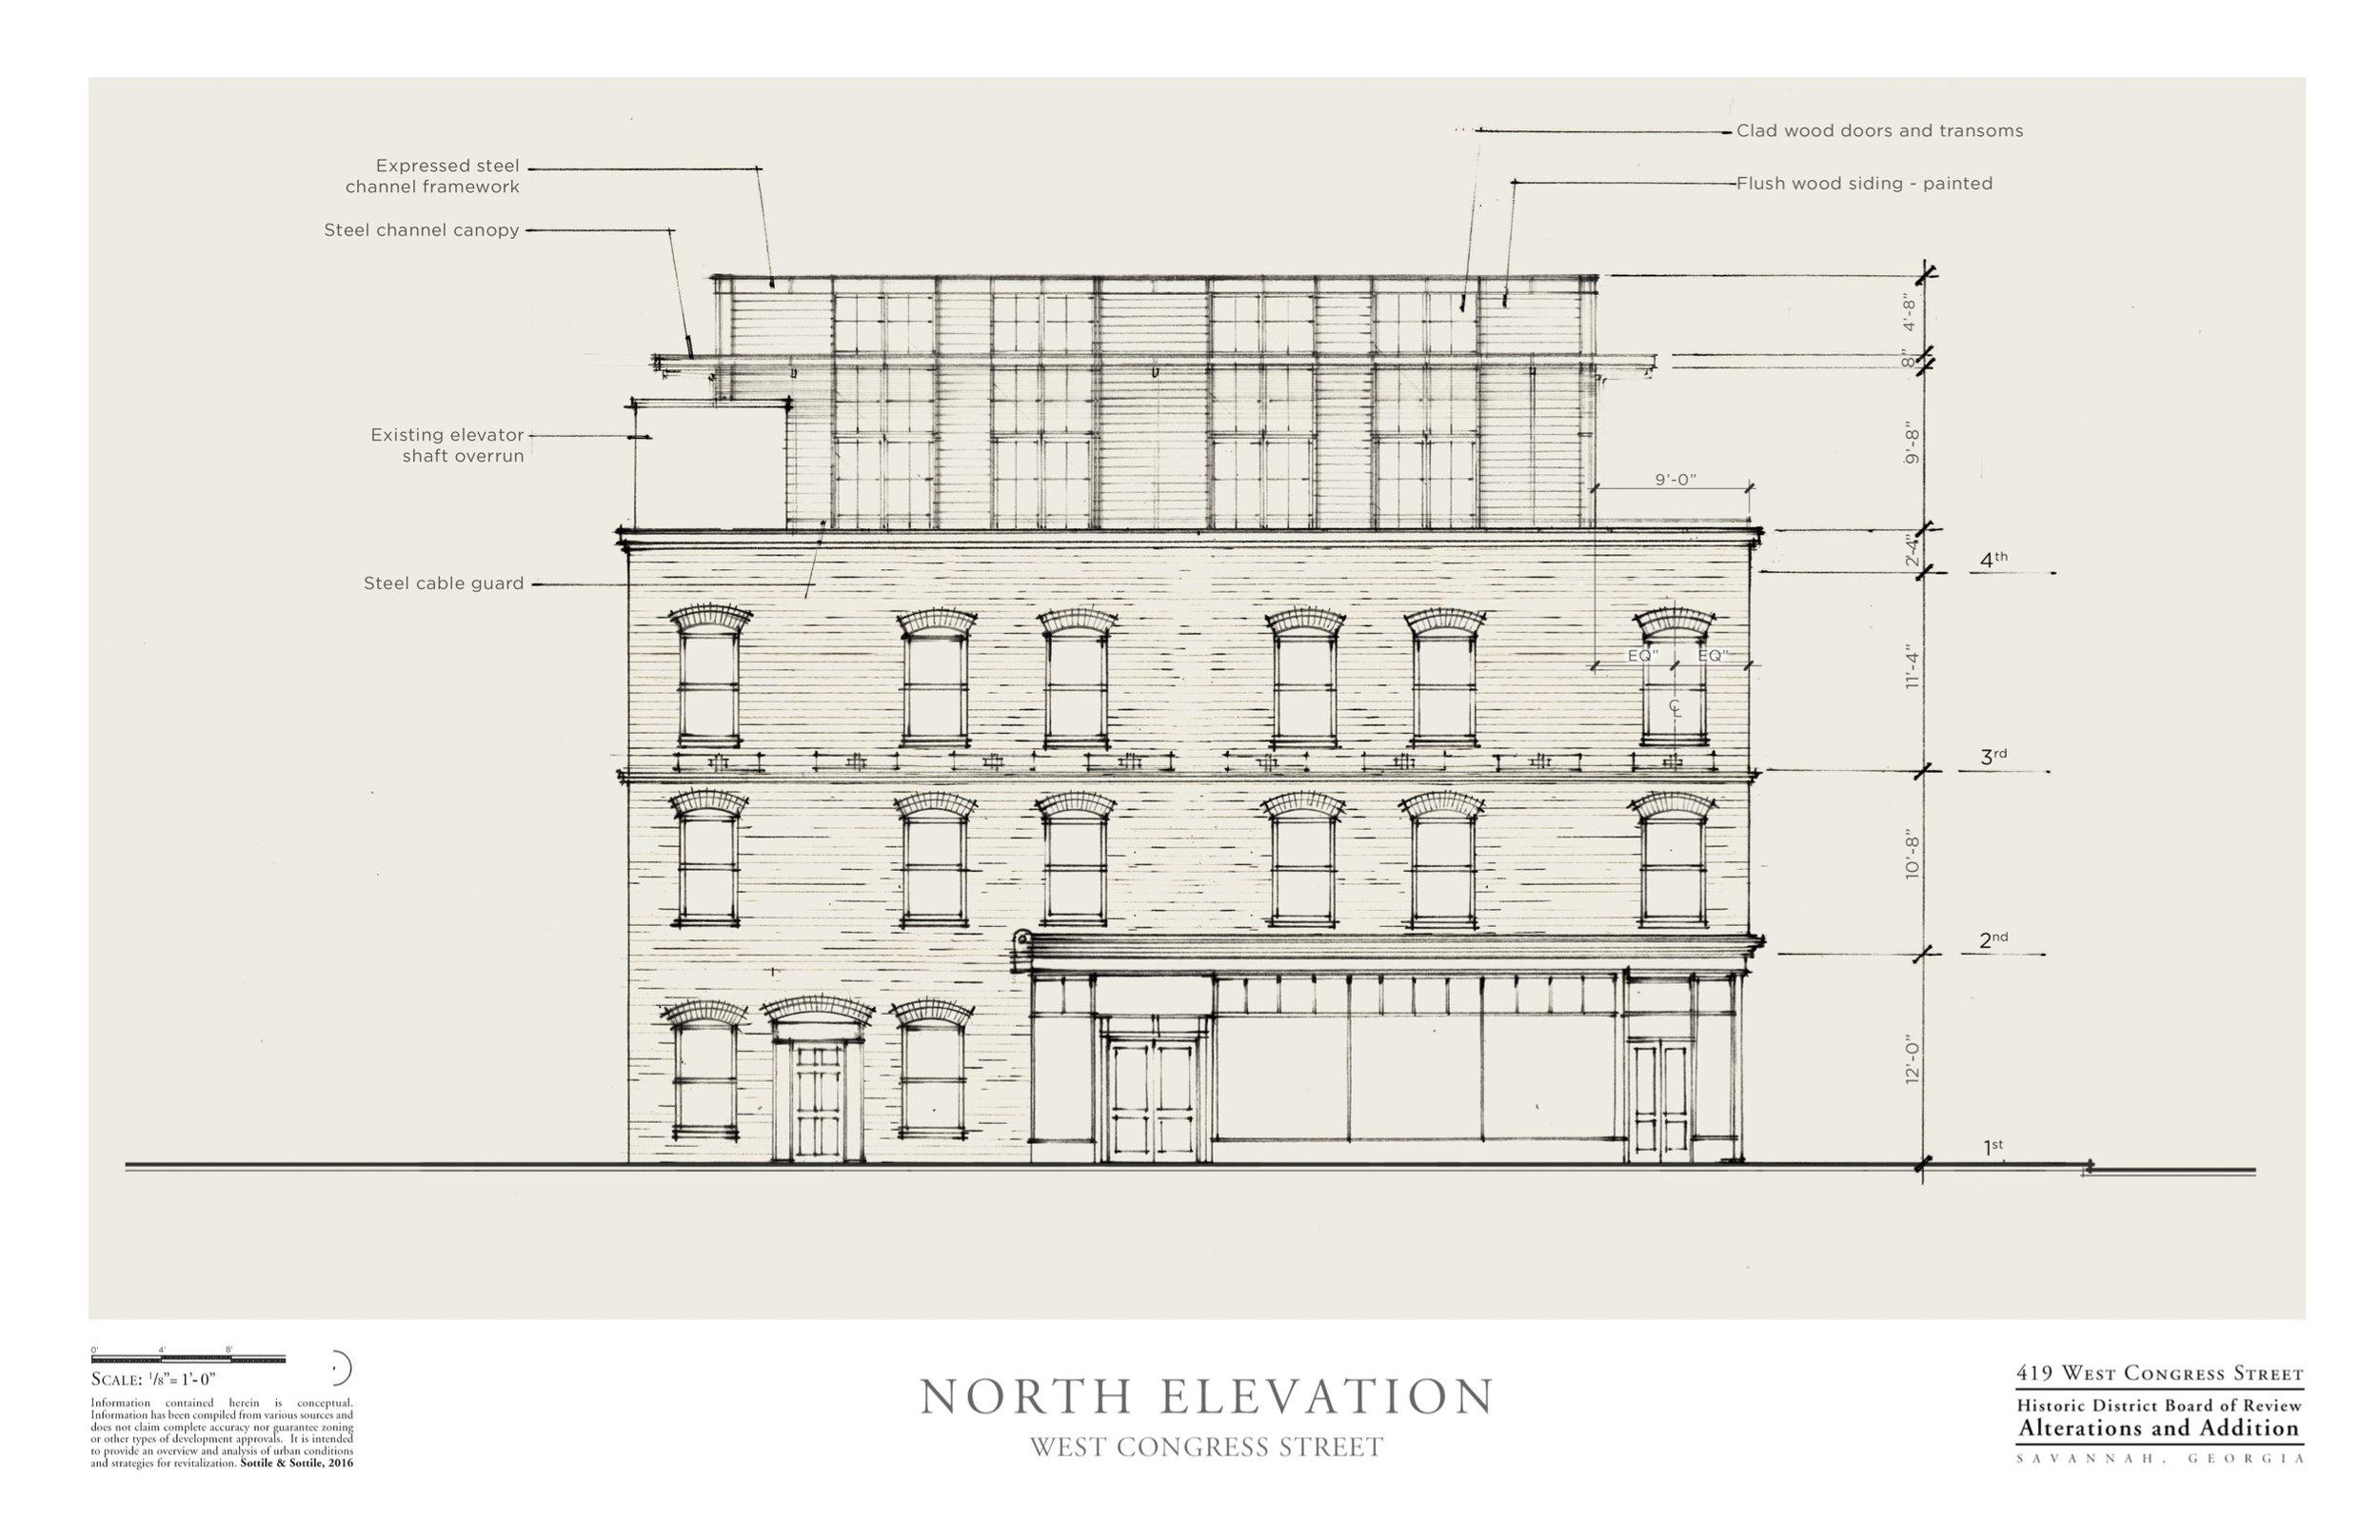 northelevation_bw.jpg